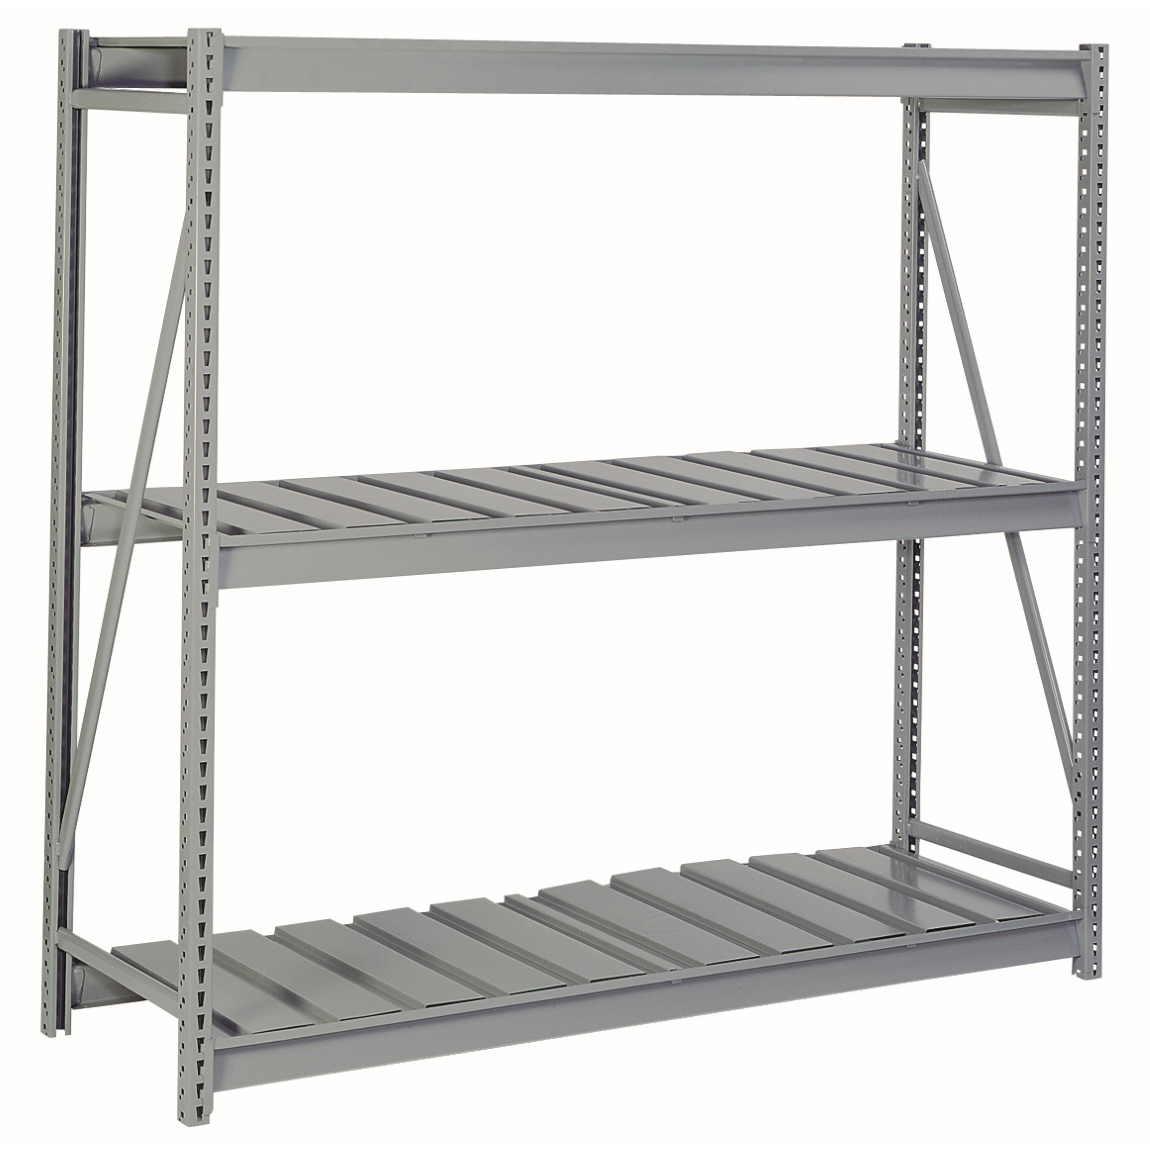 Bulk Storage Rack With Ribbed Decking Starter 96 W X 24 D X 72 H